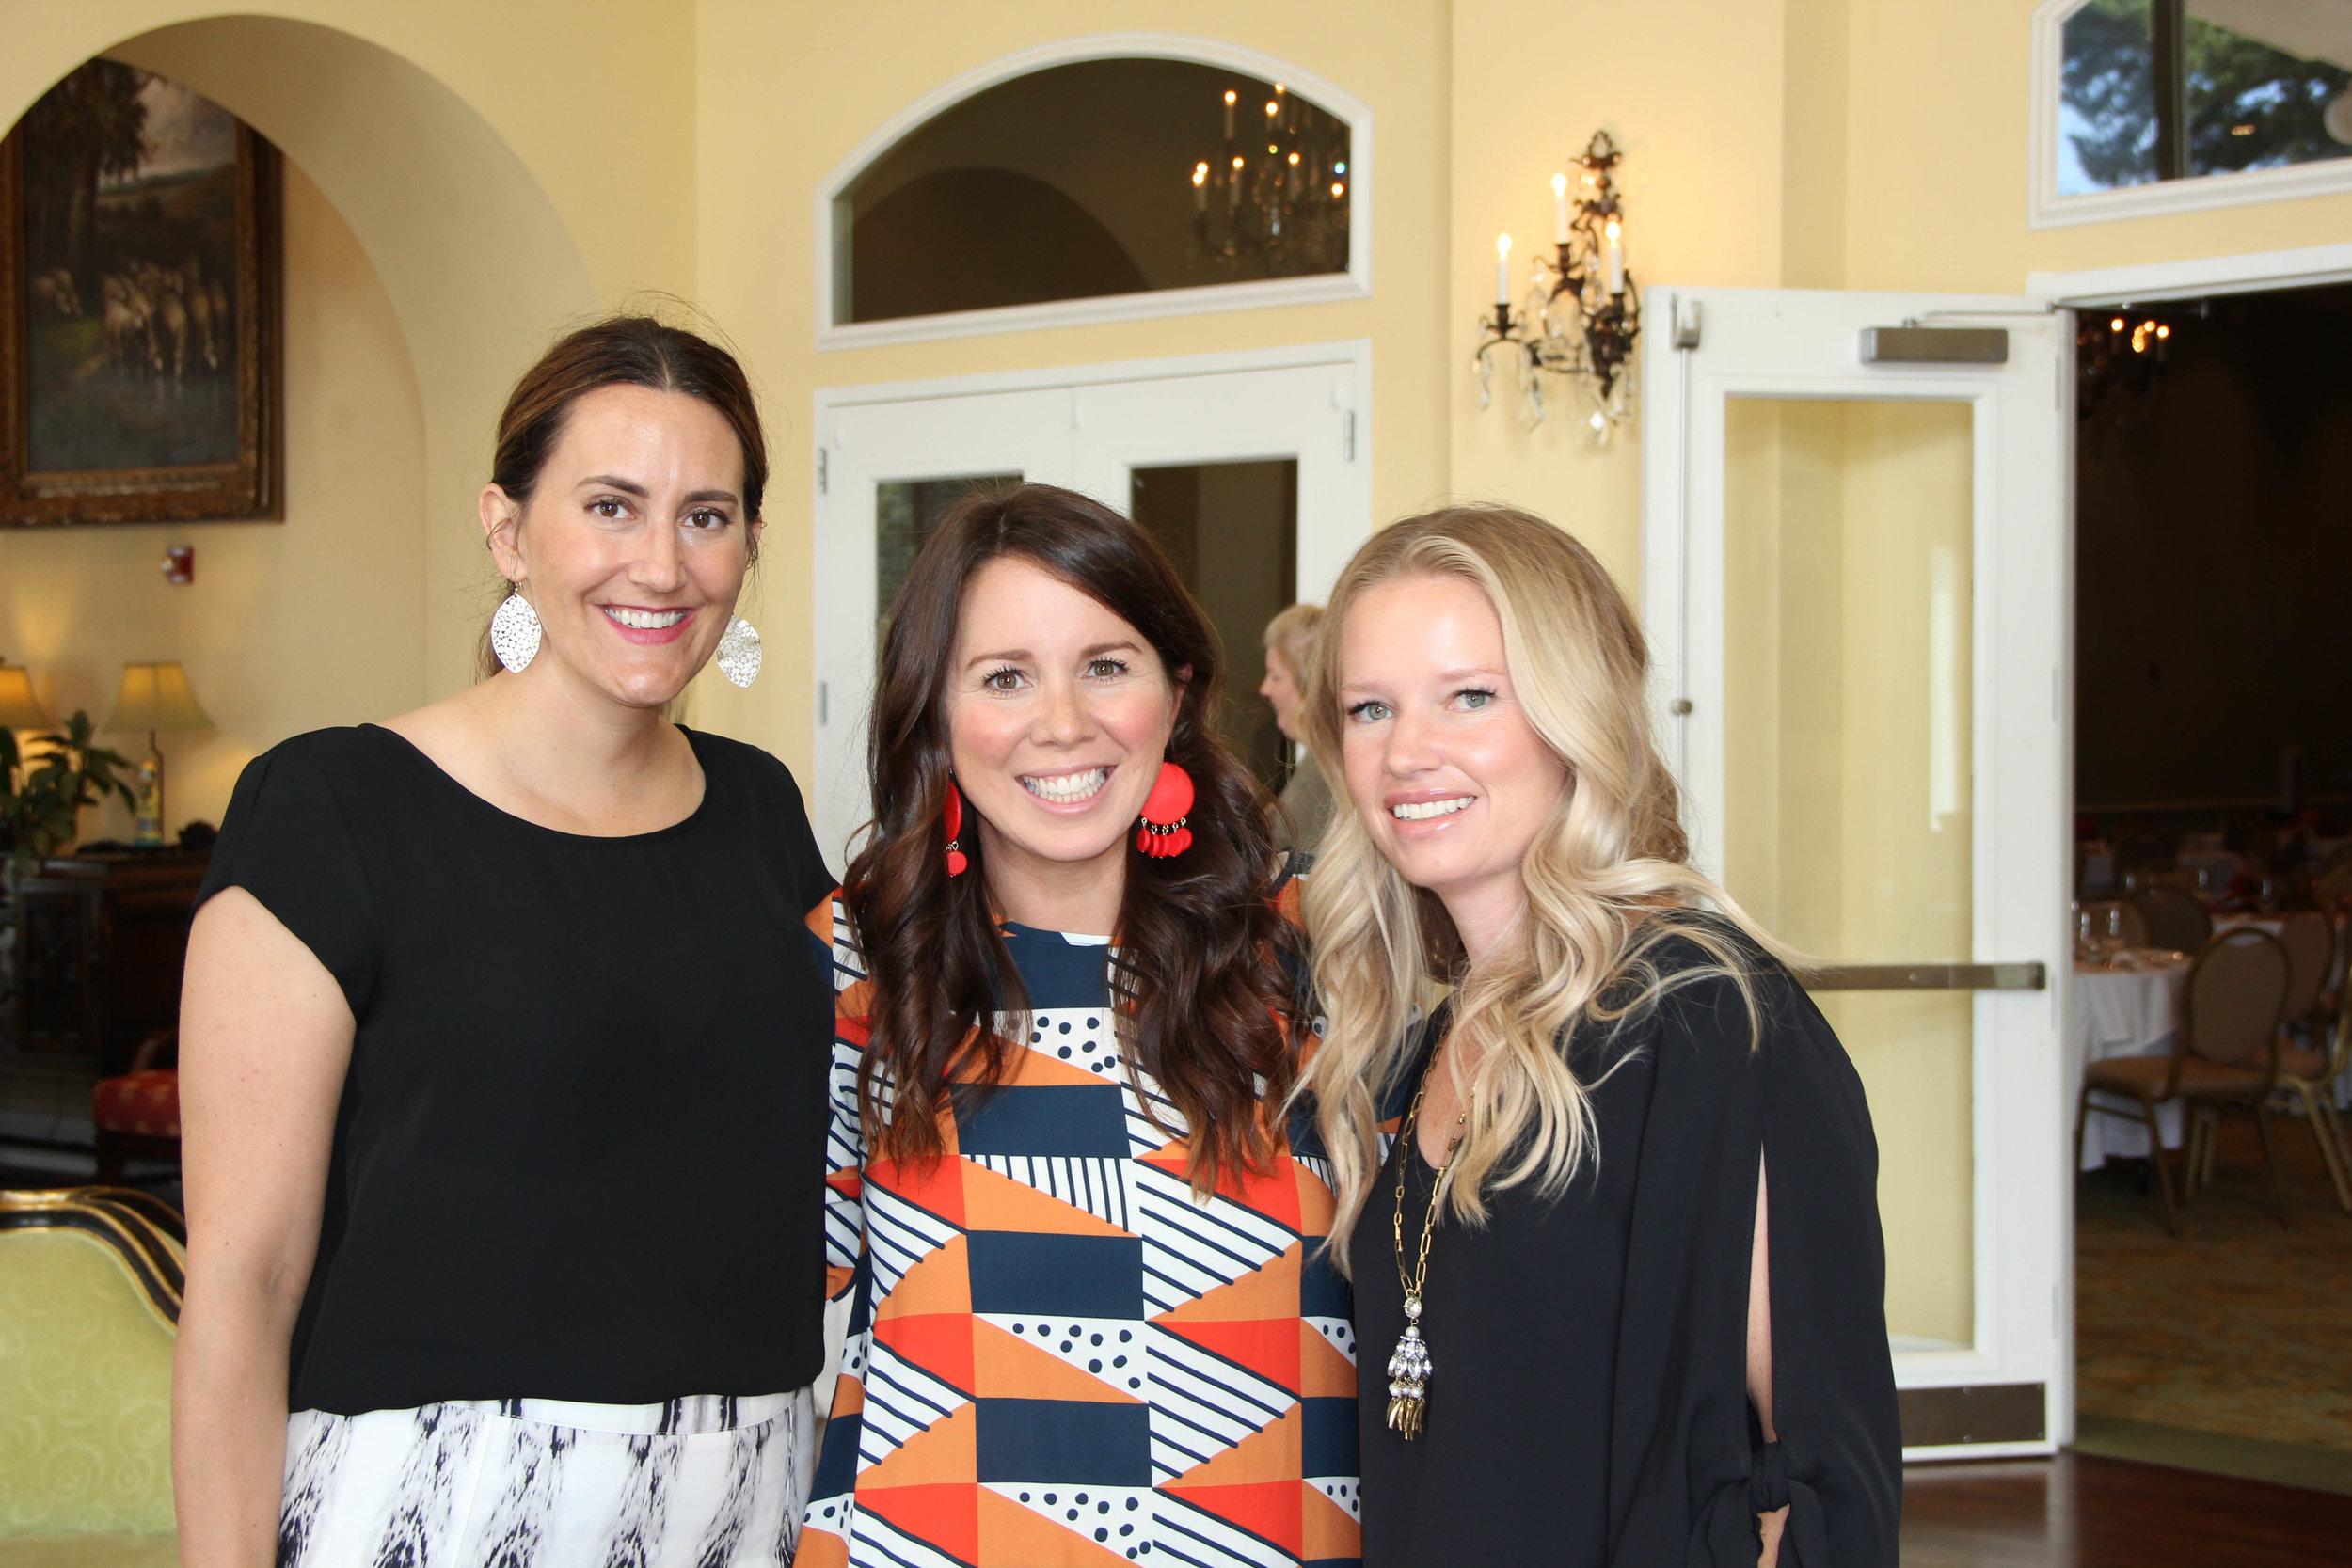 Jordan Miller, Ashley Gibbs and Jill Flanagan